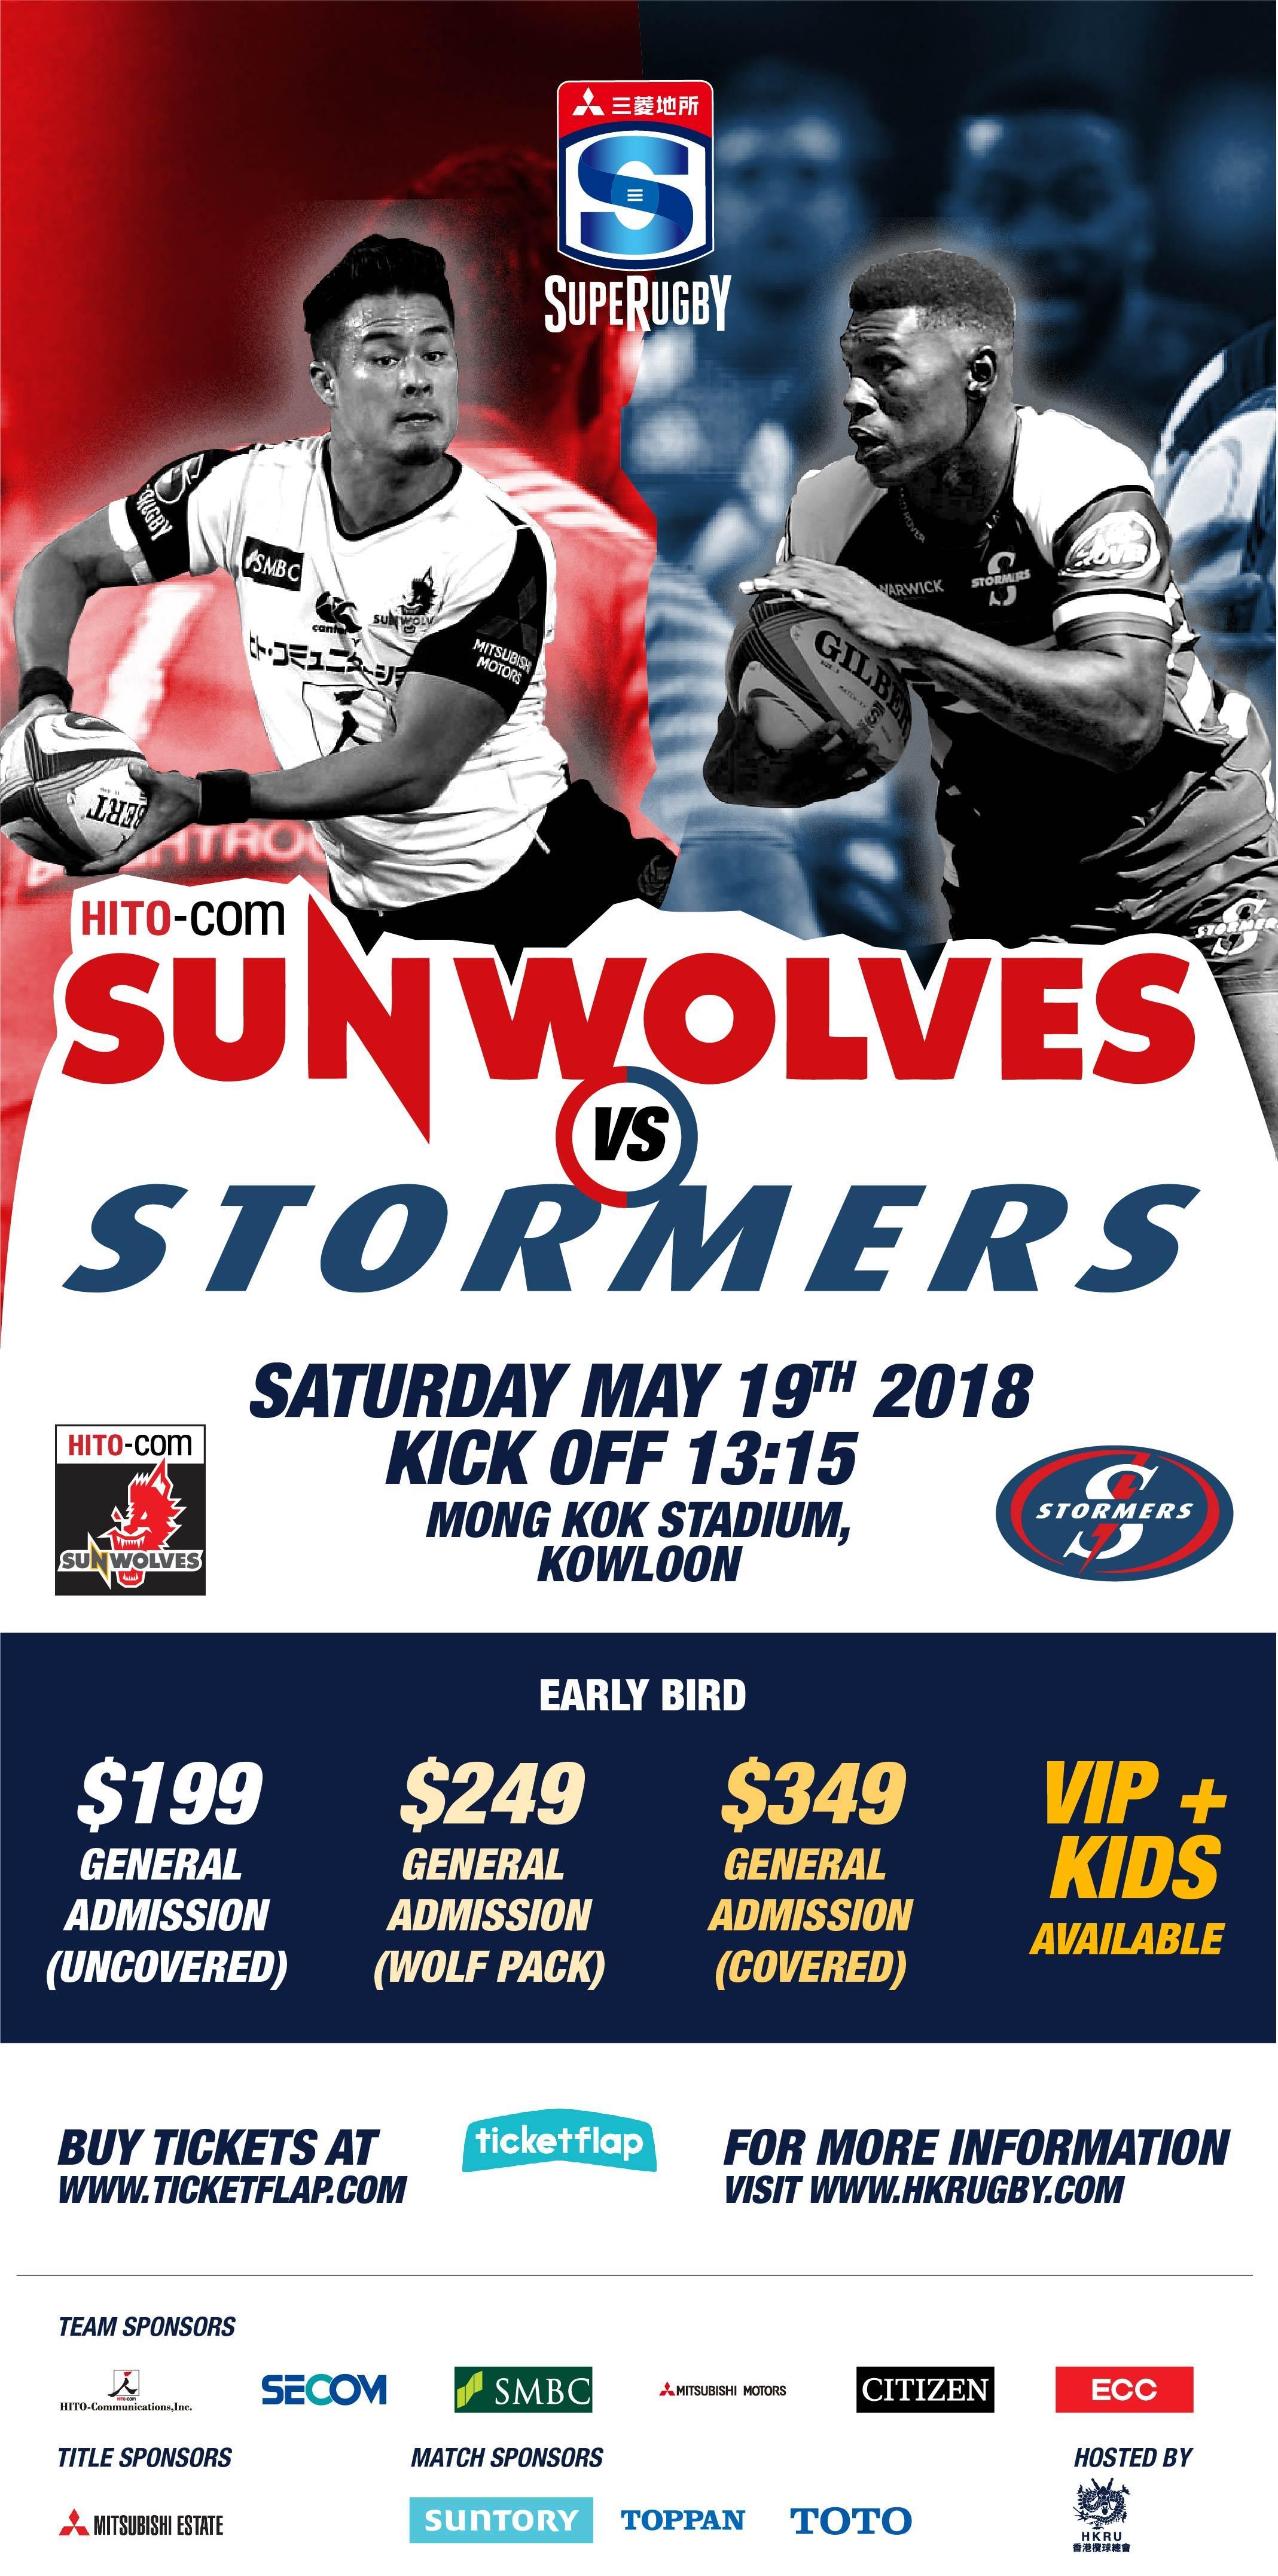 10440-Stormers_vs_Sunwolves_Landscape-5-05_EB-spreadout.jpg#asset:22986